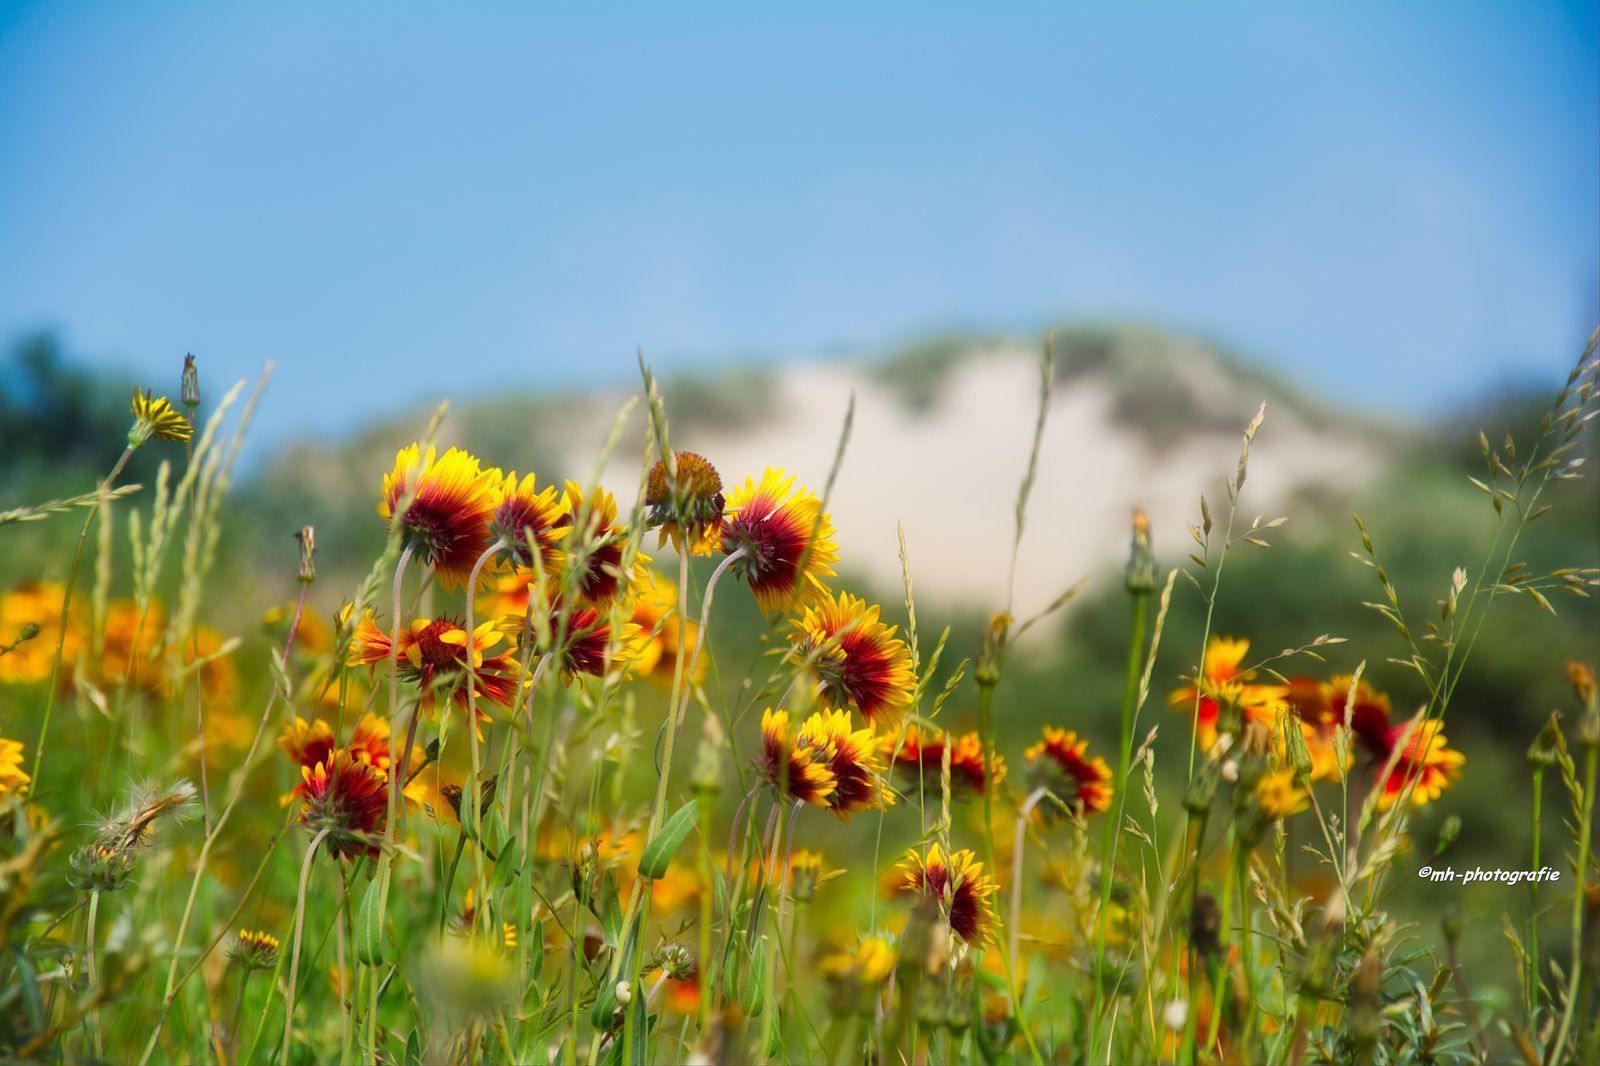 Blumen-DSC_4950-mh-photografie